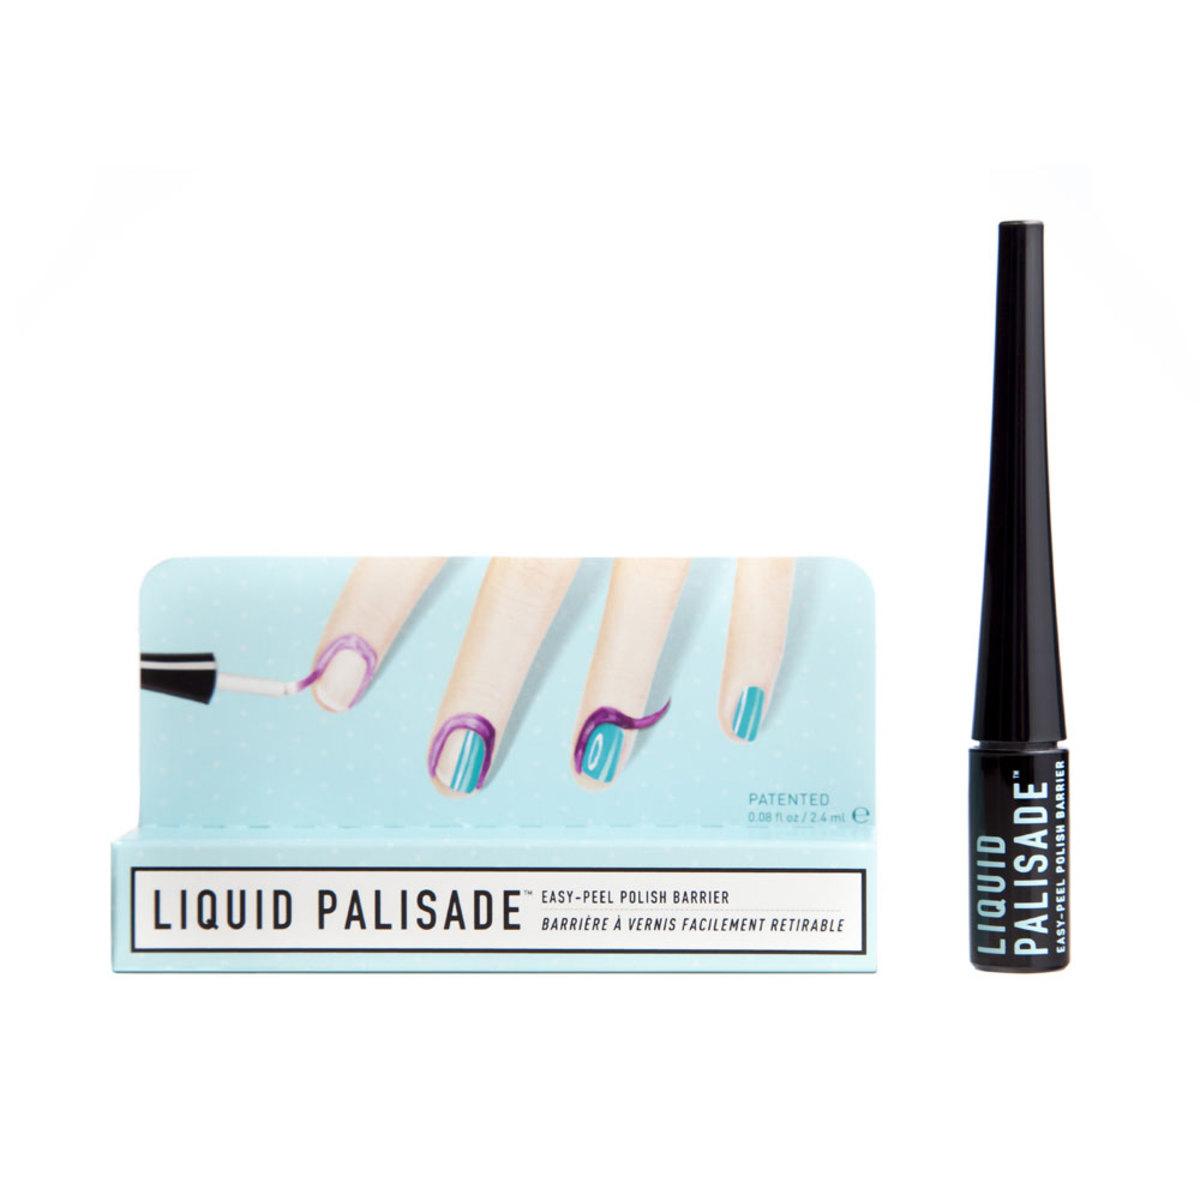 Liquid Palisade Easy Peel Polish Barrier (Thick Brush)